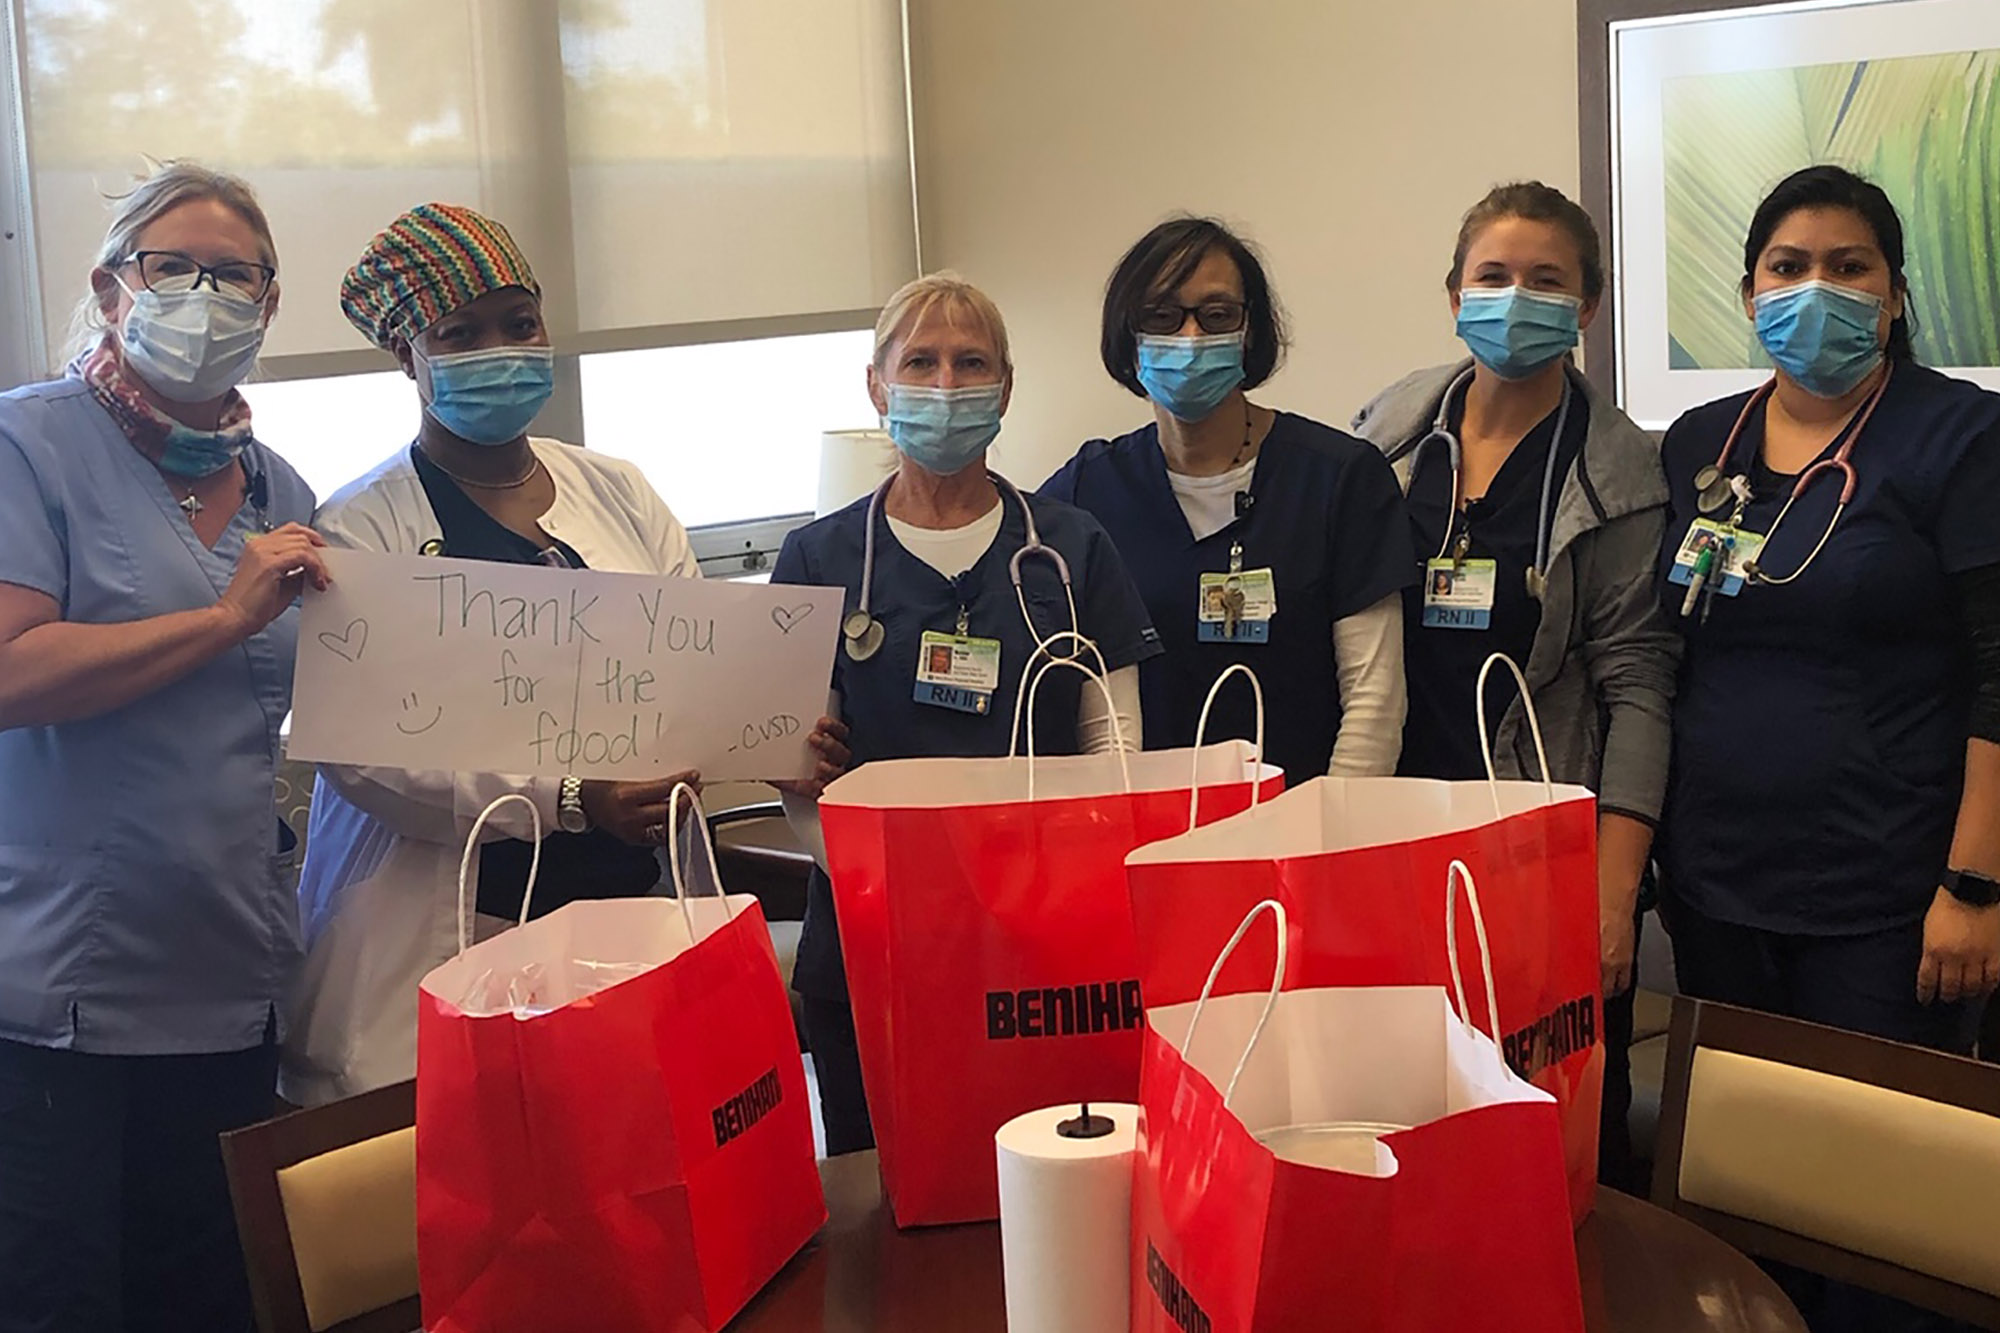 Benihana Boca Raton donated lunch to the nursing staff